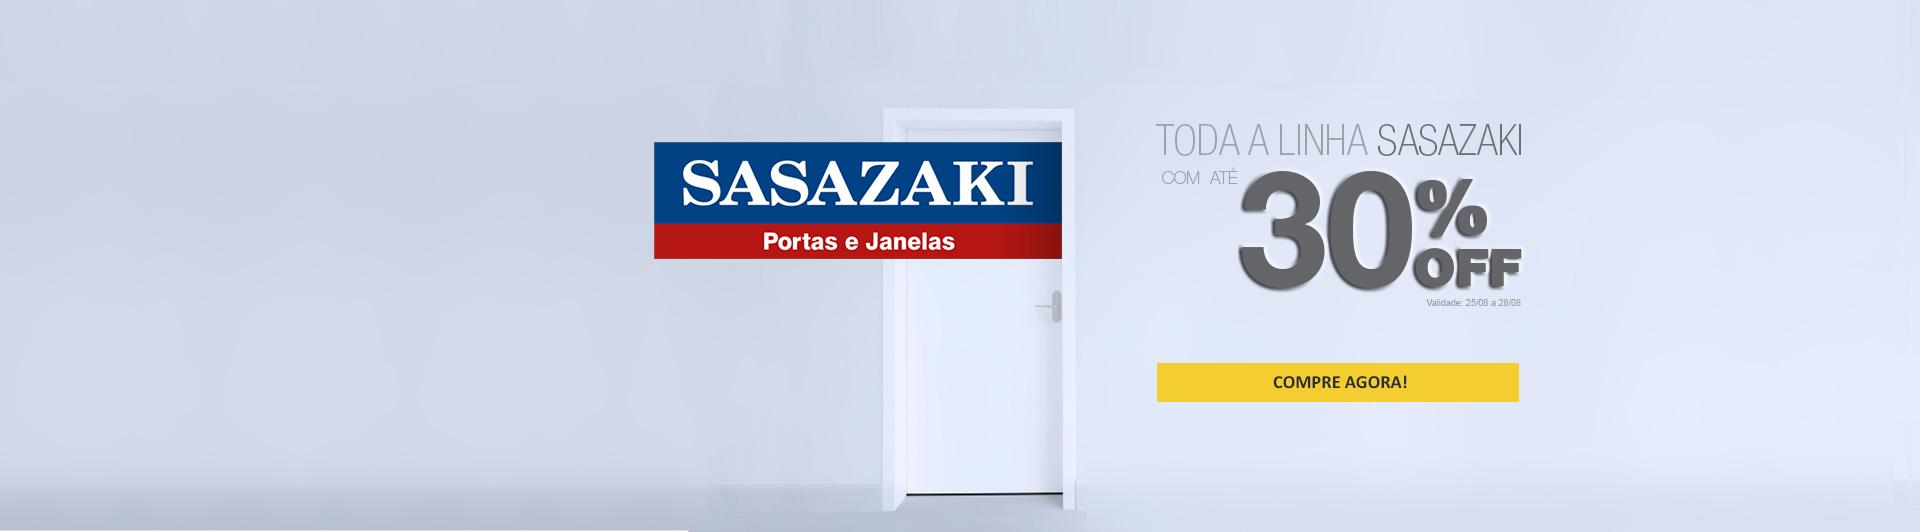 Banner Sasazaki